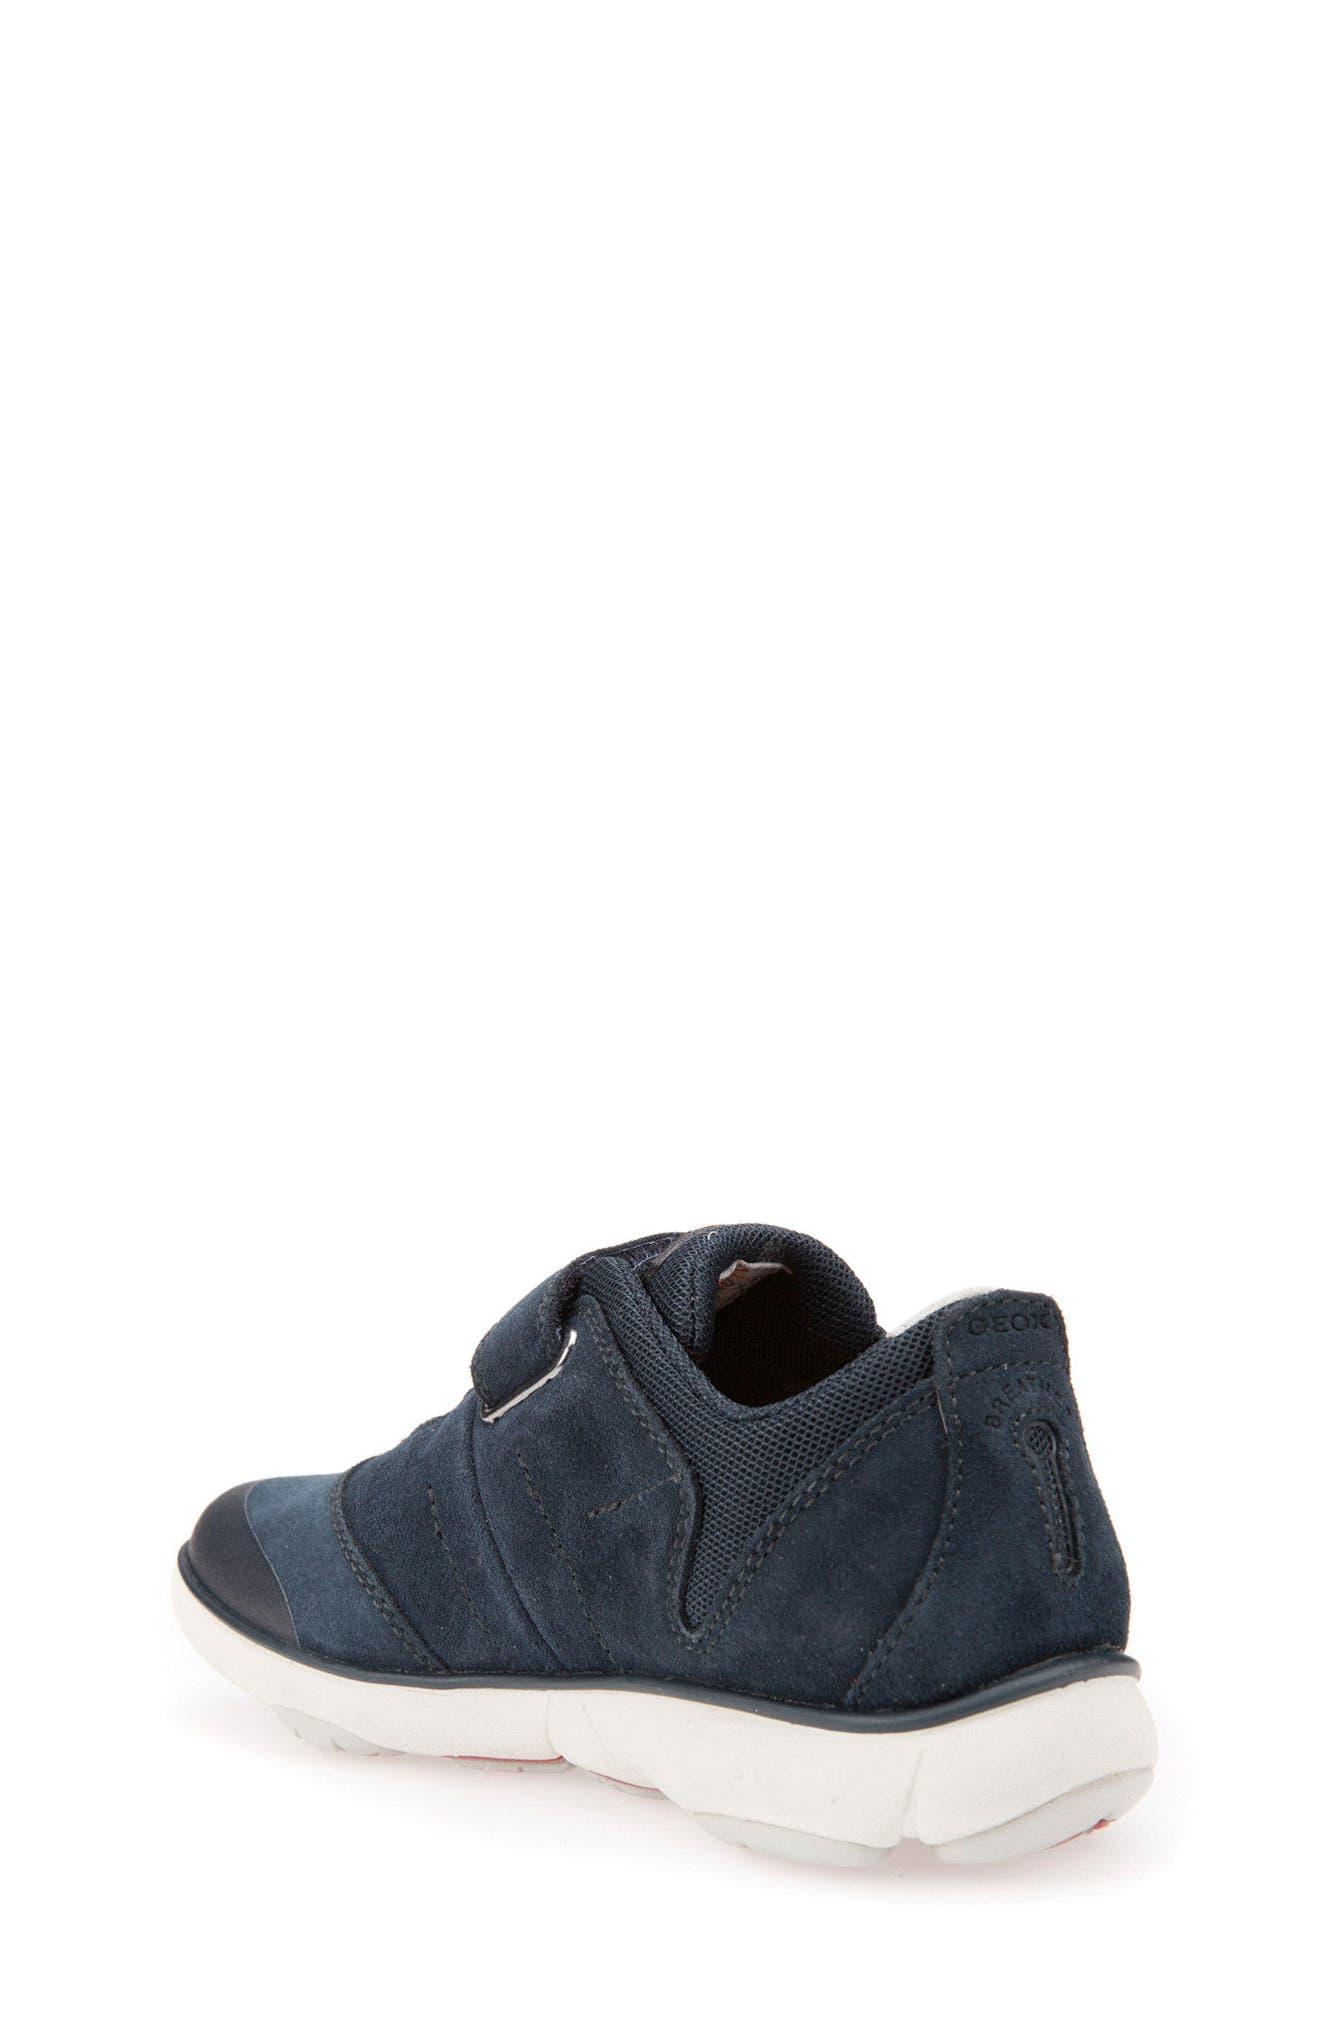 Alternate Image 2  - Geox Nebula Low Top Sneaker (Toddler, Little Kid & Big Kid)